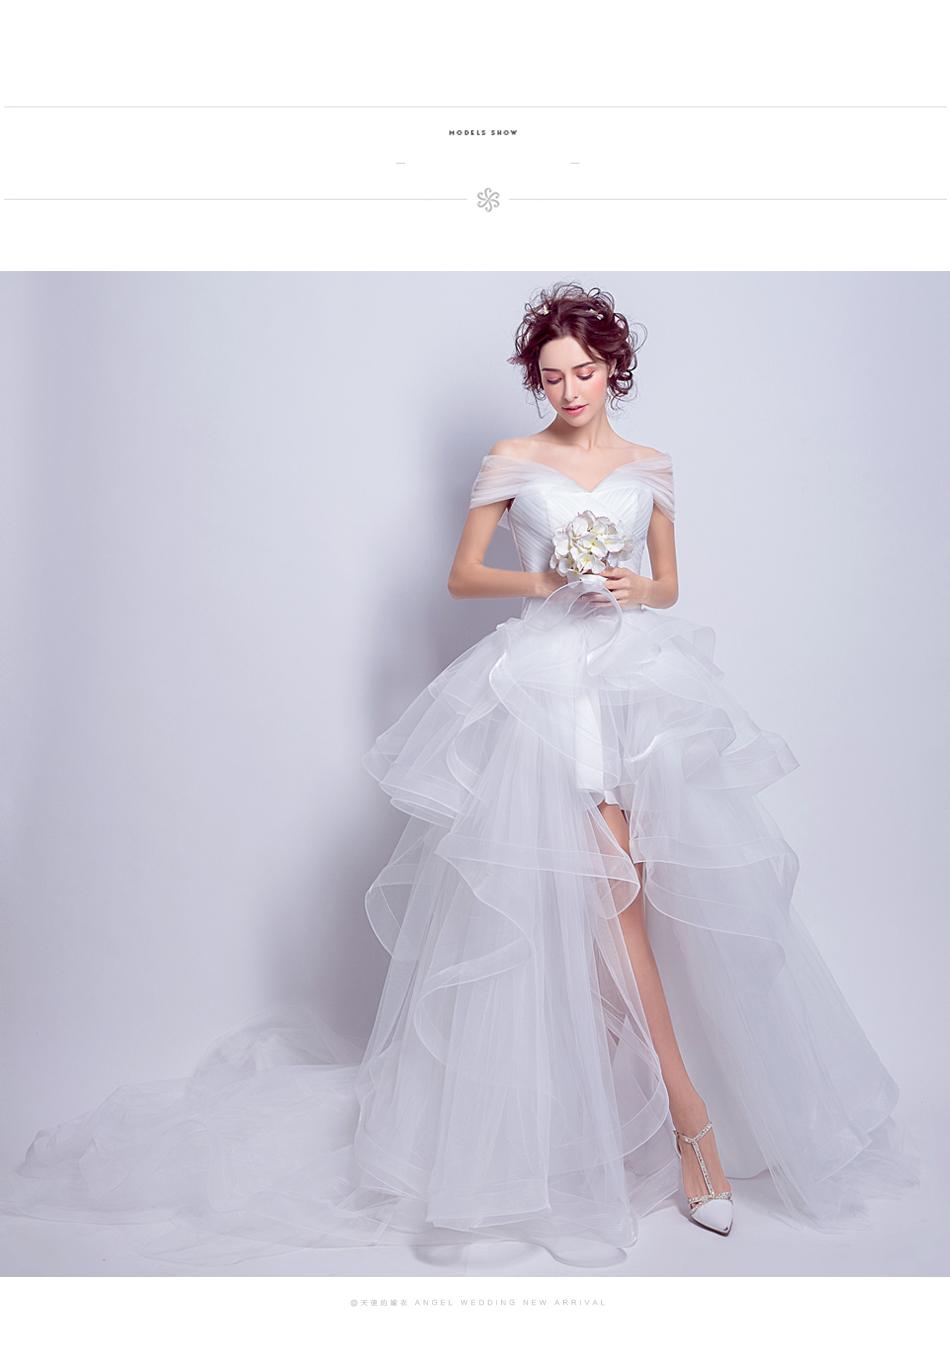 Angel Wedding Dress Marriage Evening Bride Party Prom Bridal Gown Vestido De Noiva 2017 Boat Neck asymmetrical7207 9